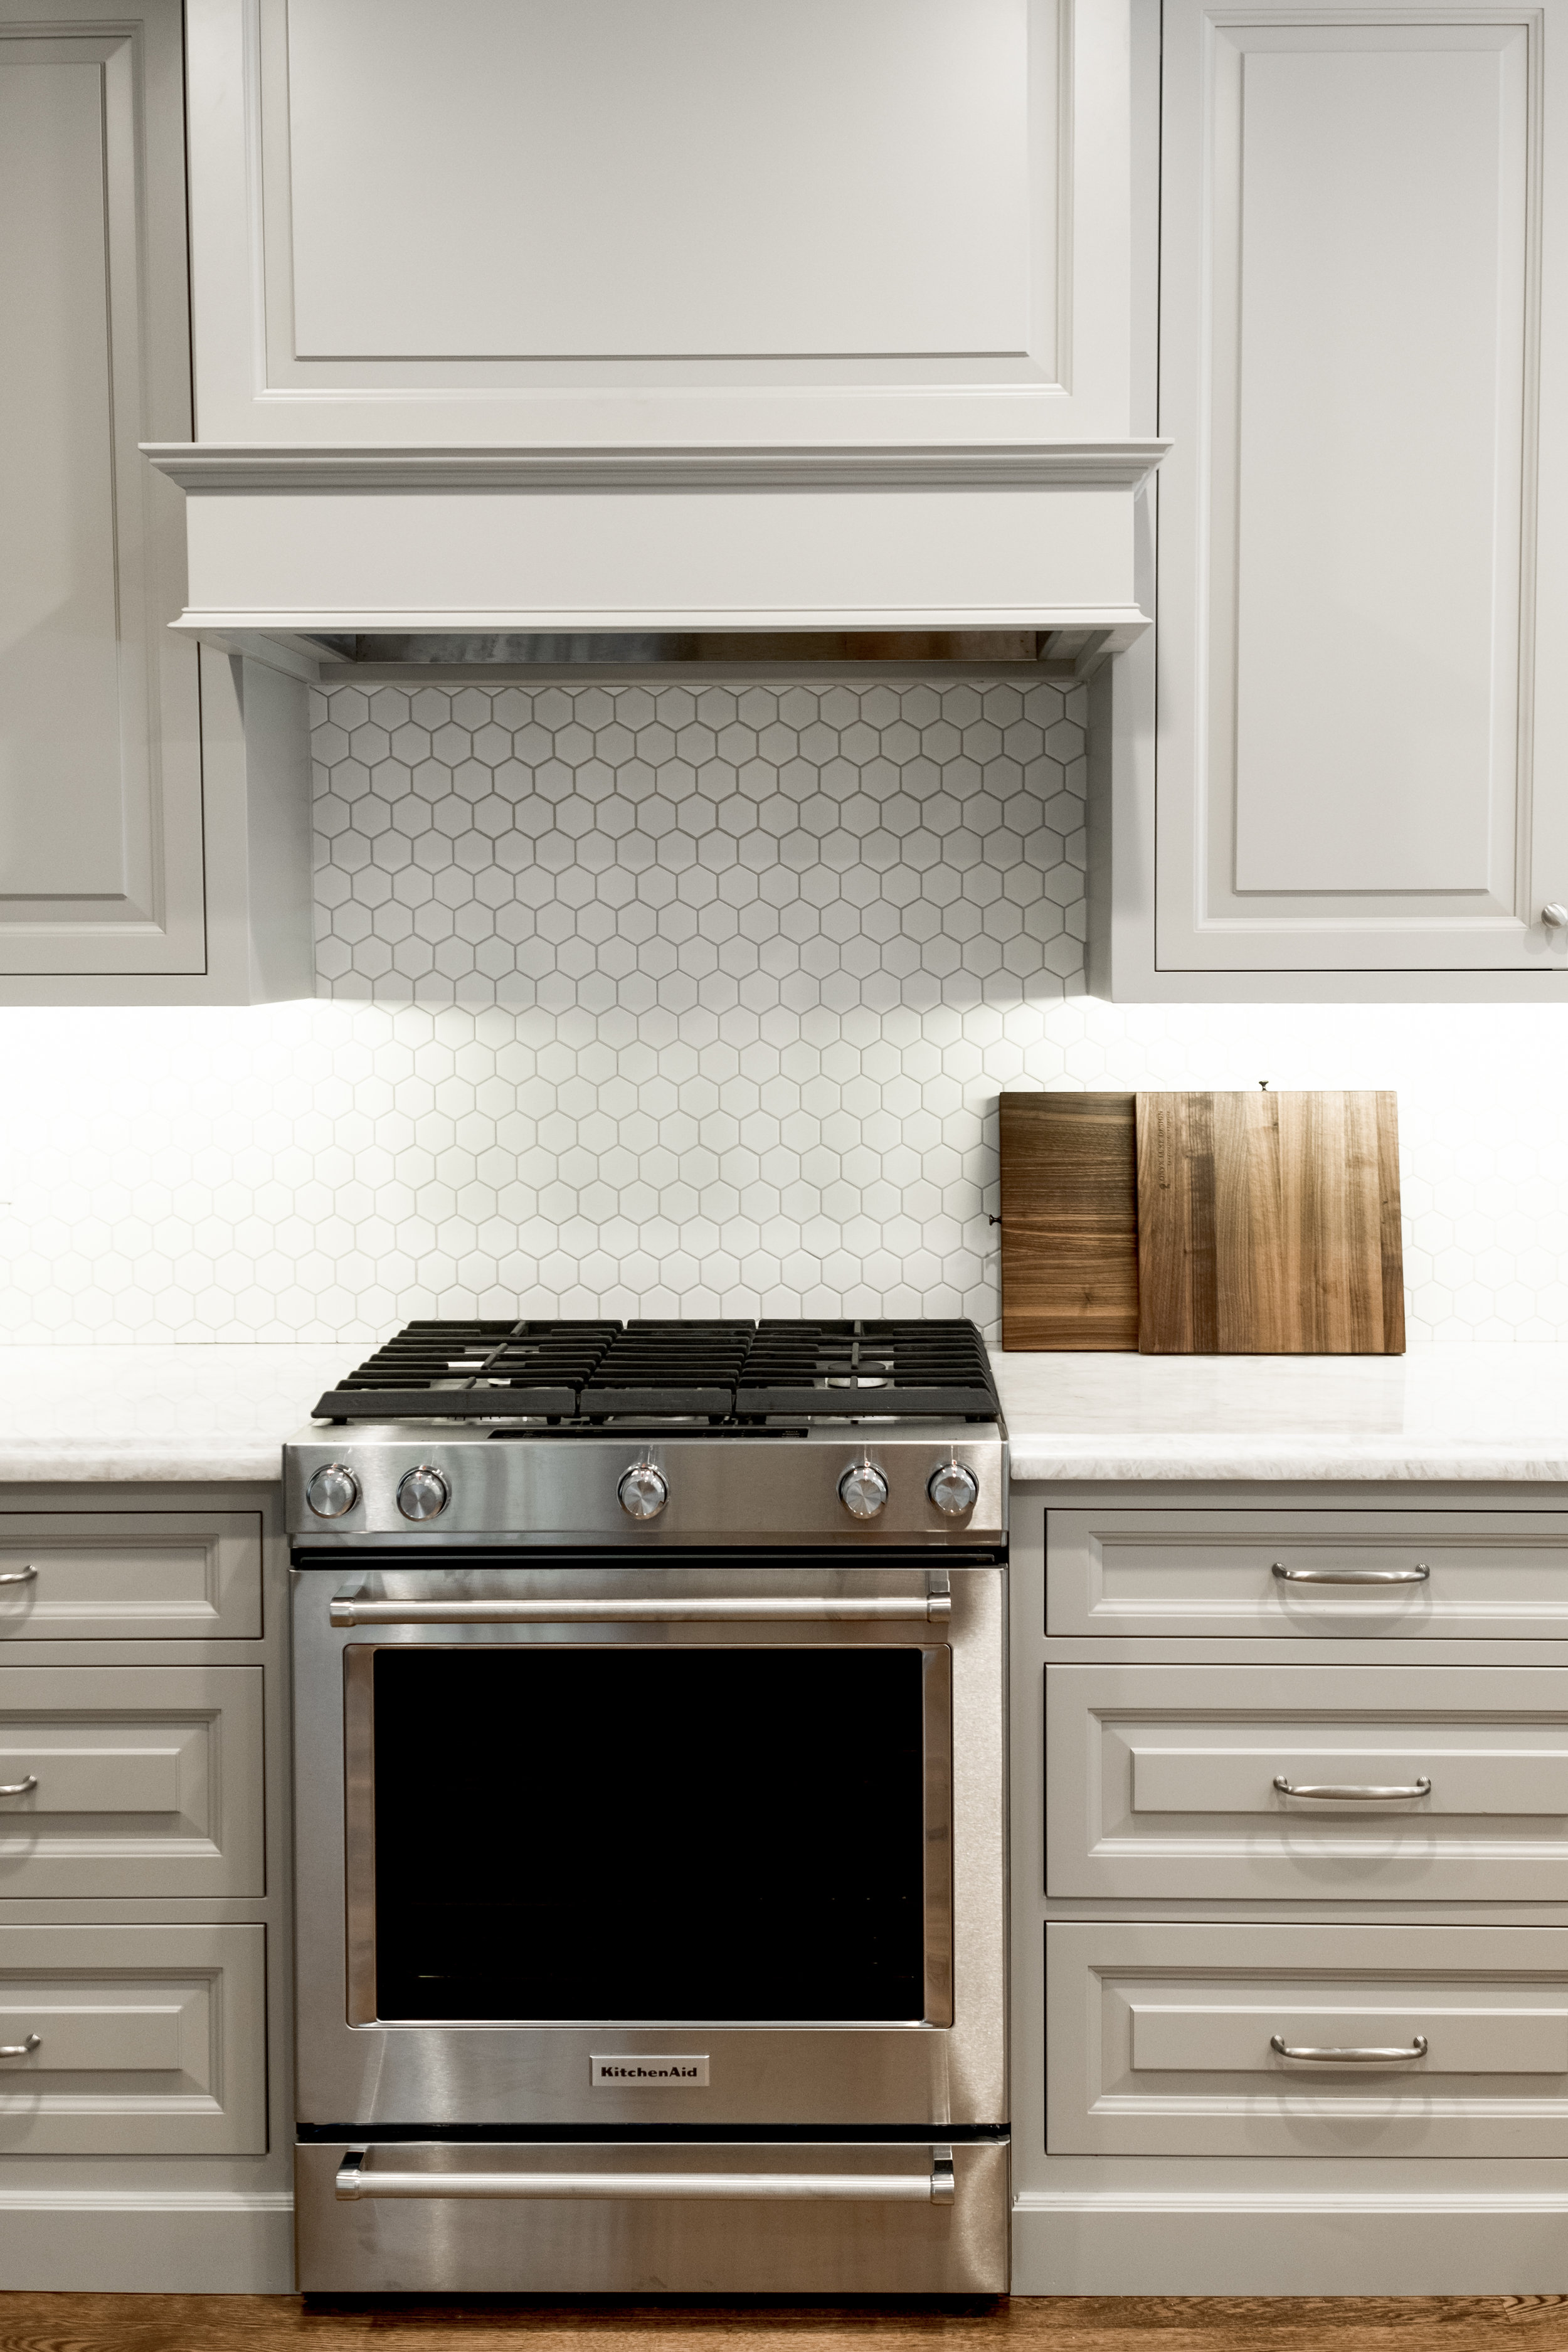 Hexagon tile in kitchen